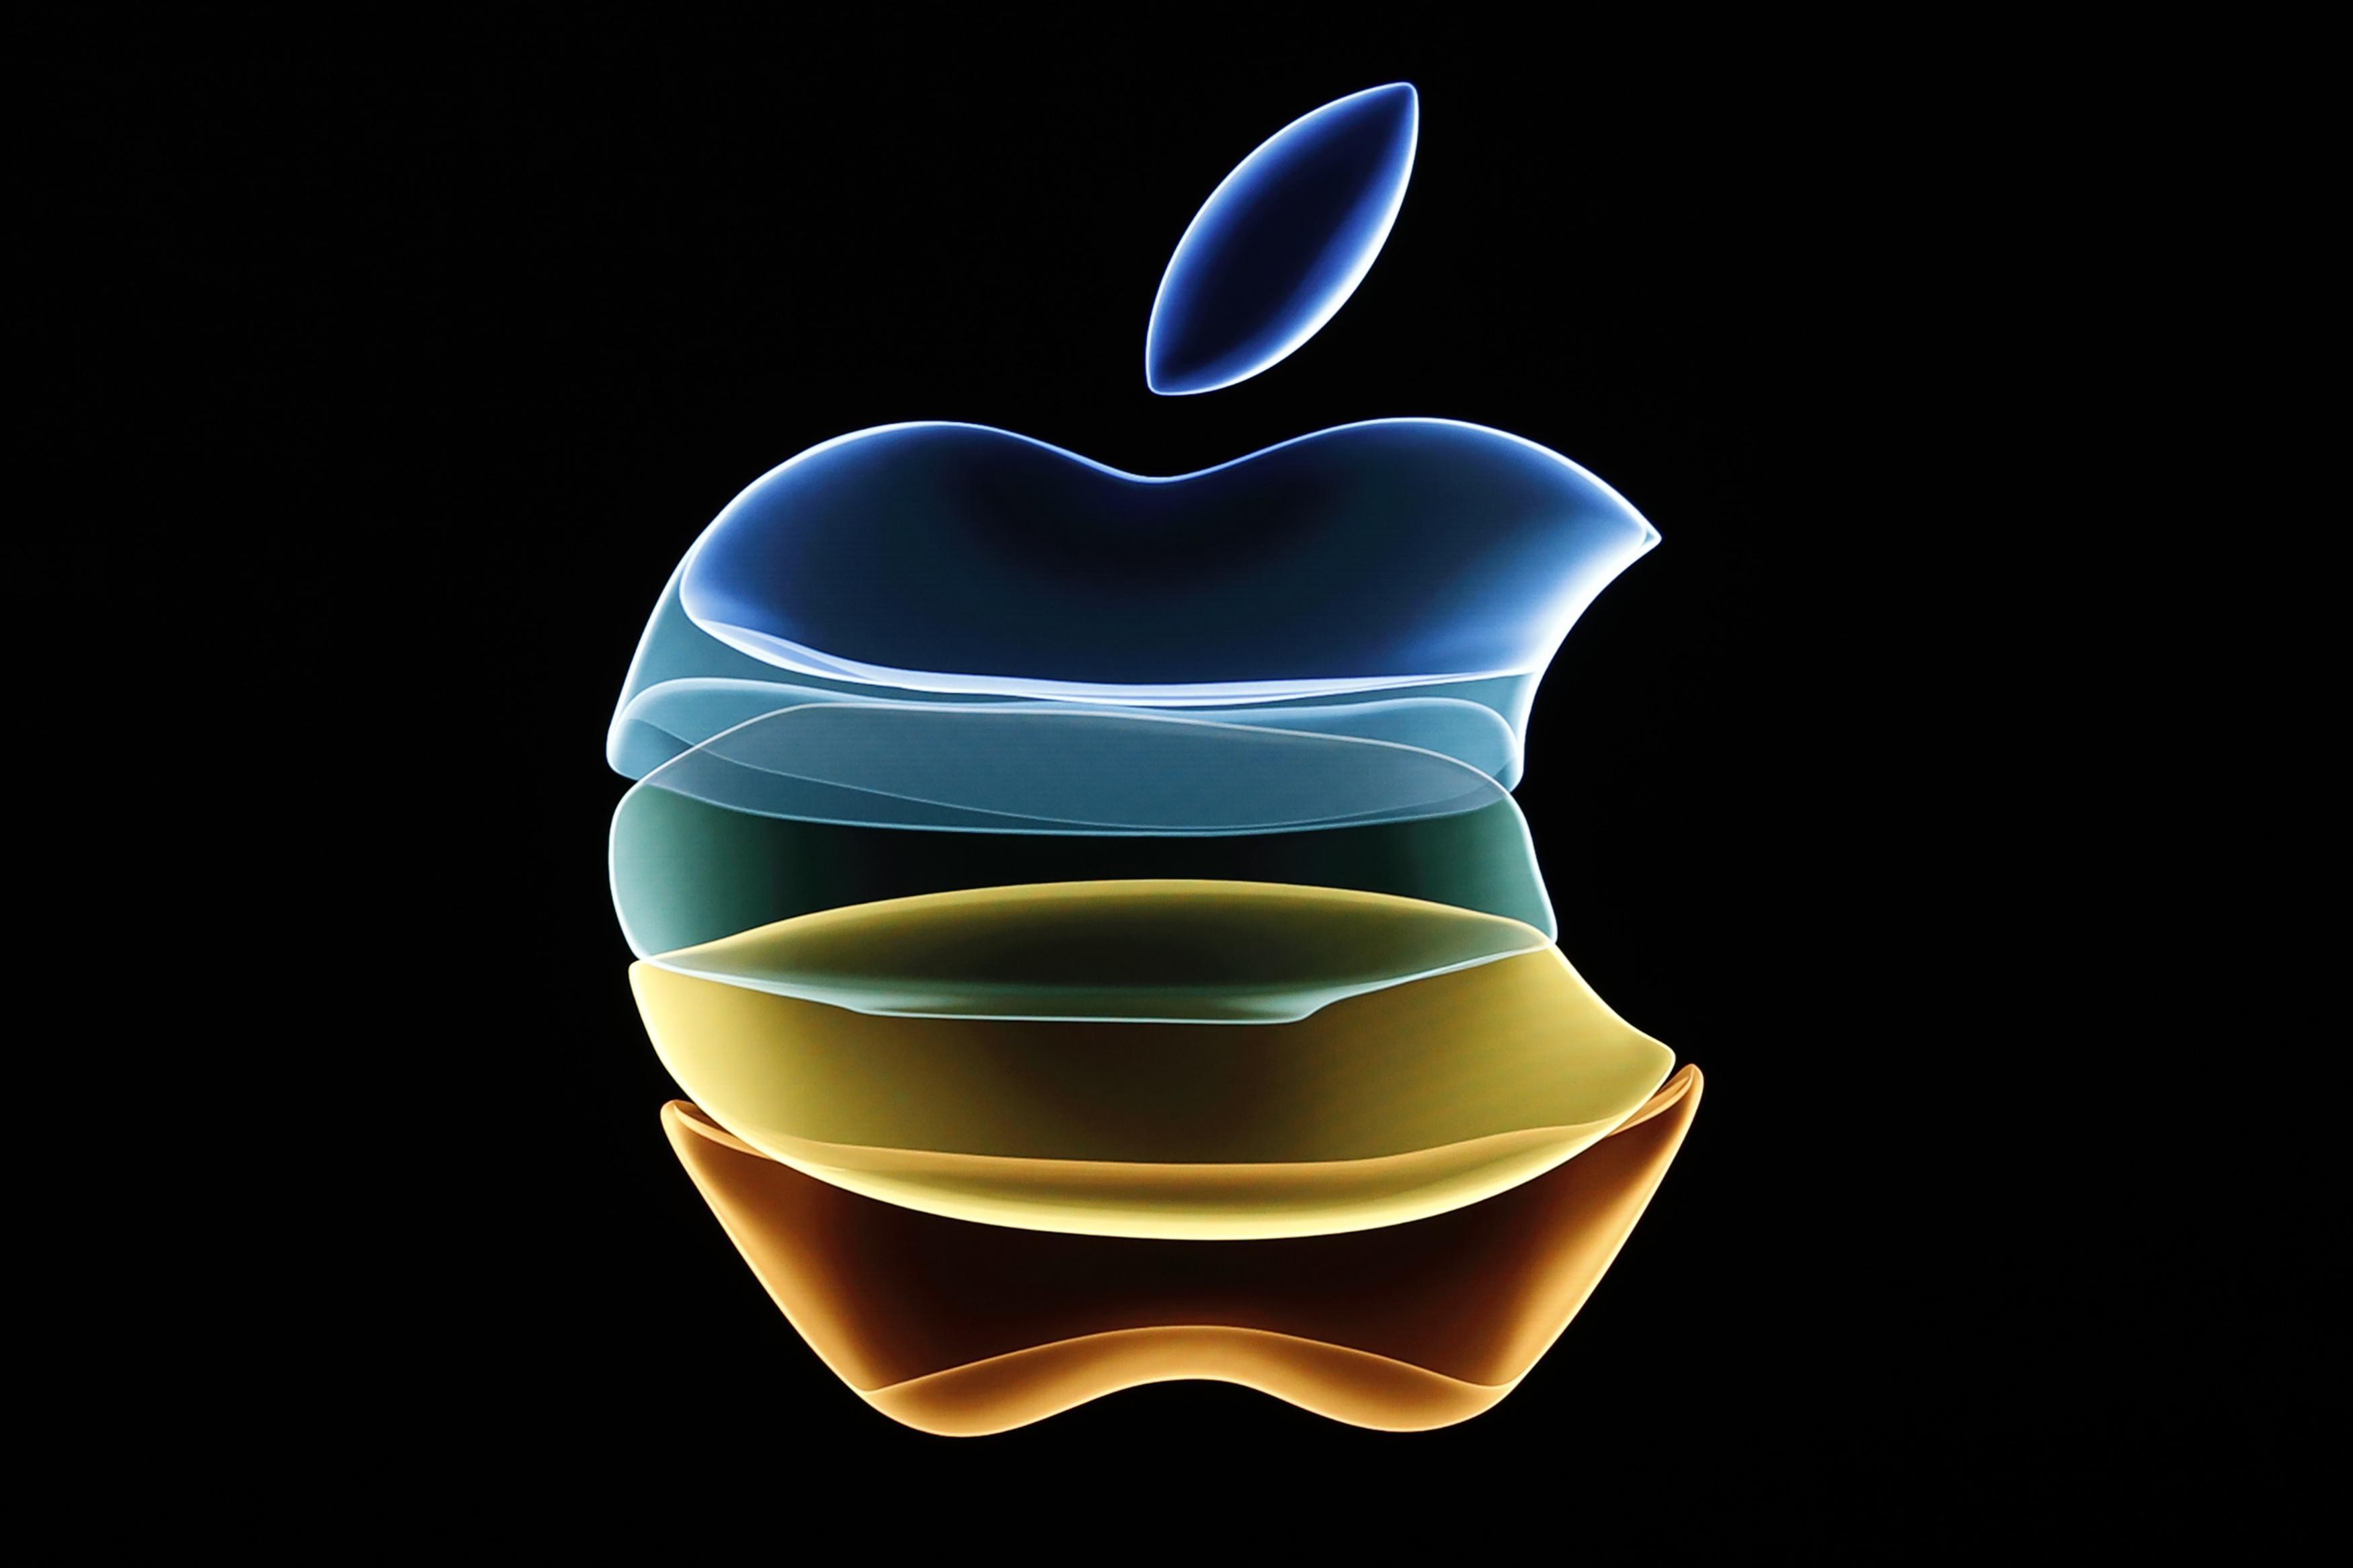 Apple takes fight against 13-billion-euro EU tax order to court